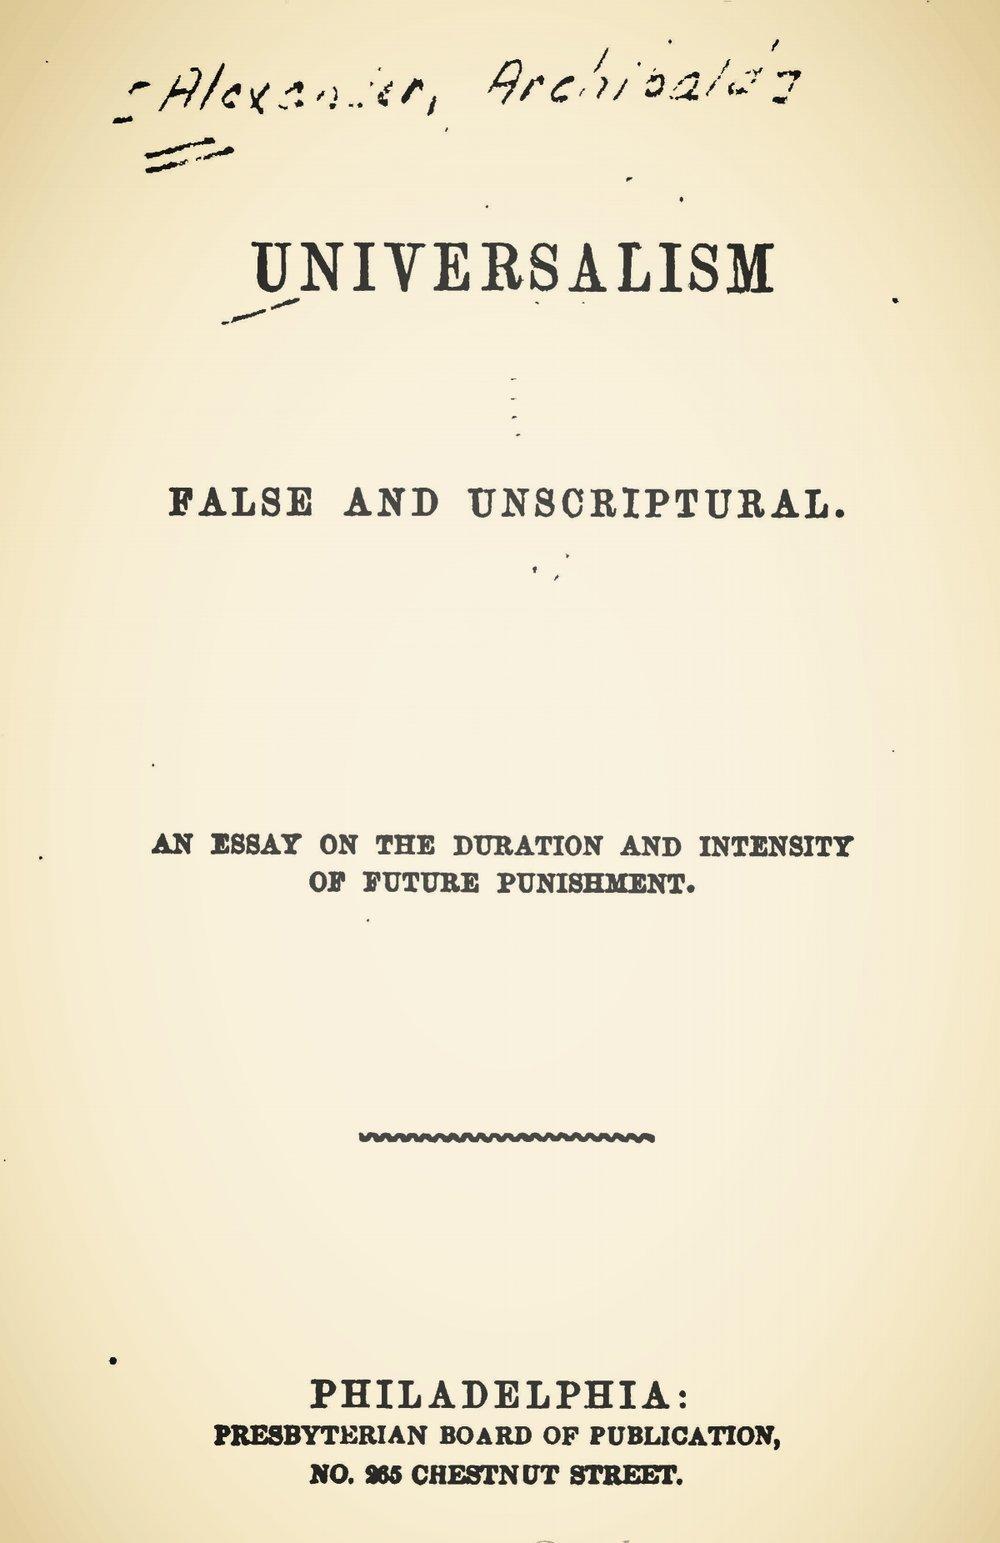 Alexander, Archibald, Universalism False and Unscriptural Title Page.jpg